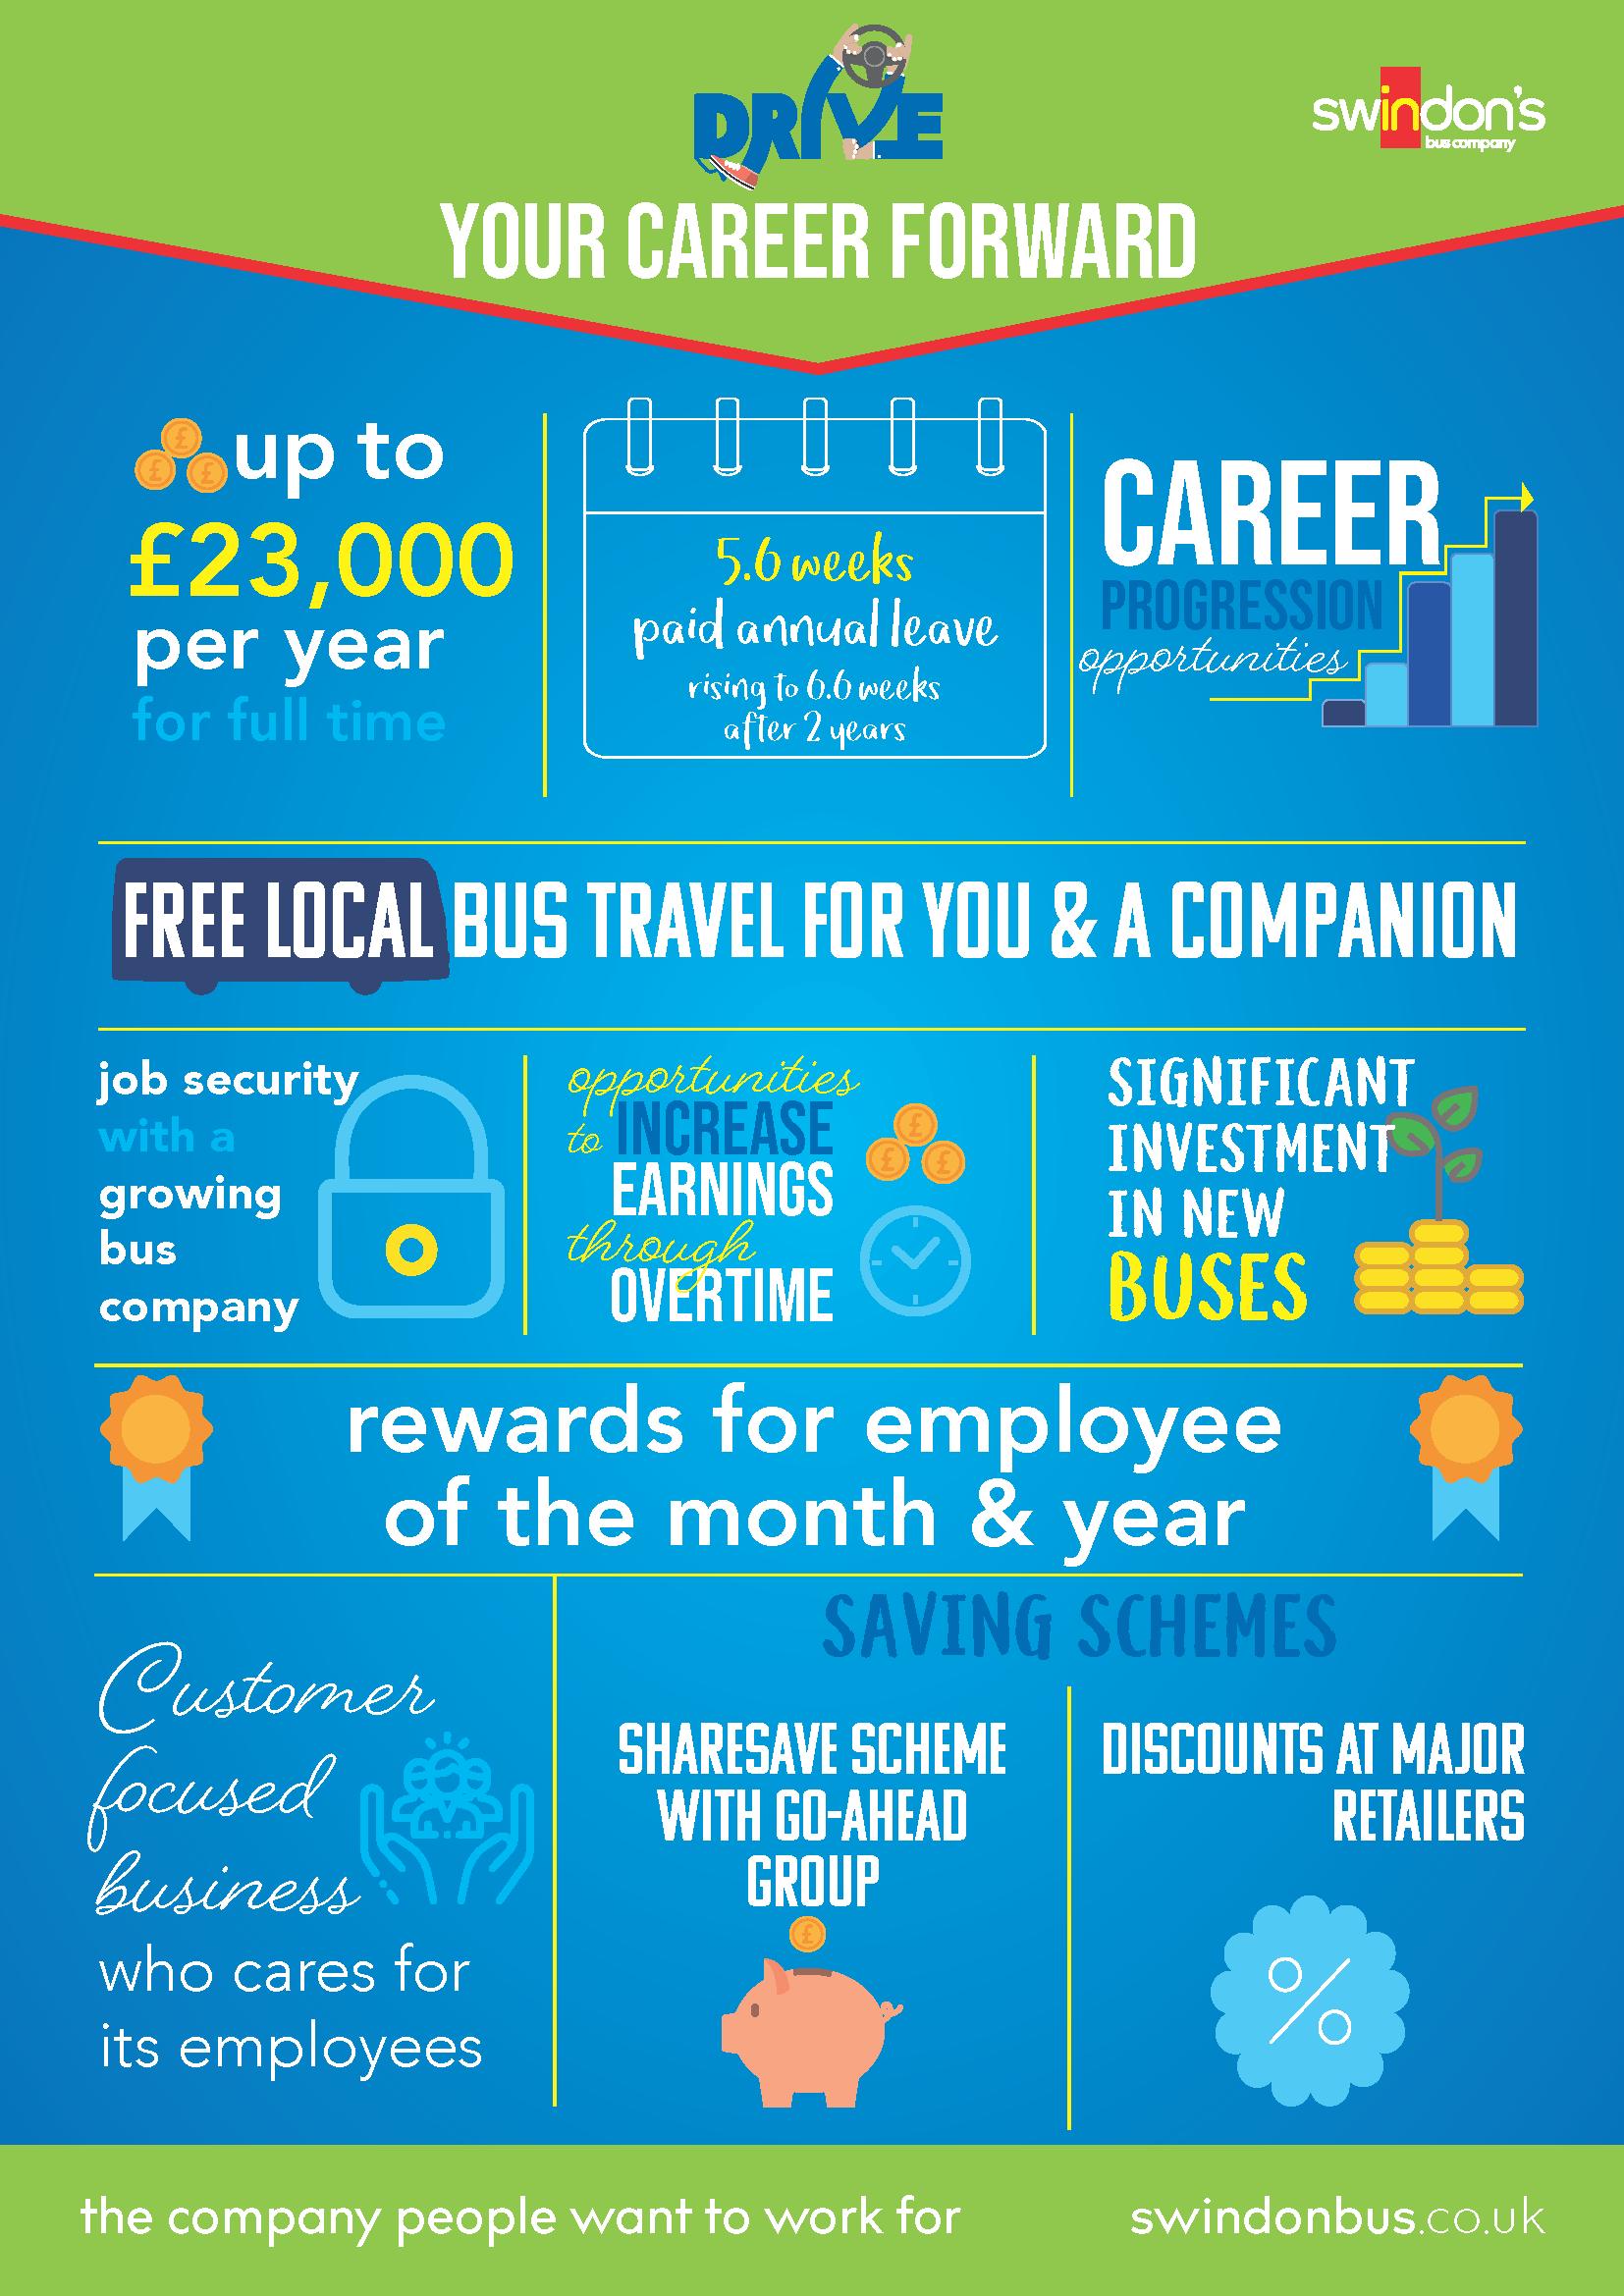 Swindon's Bus Company driver benefits